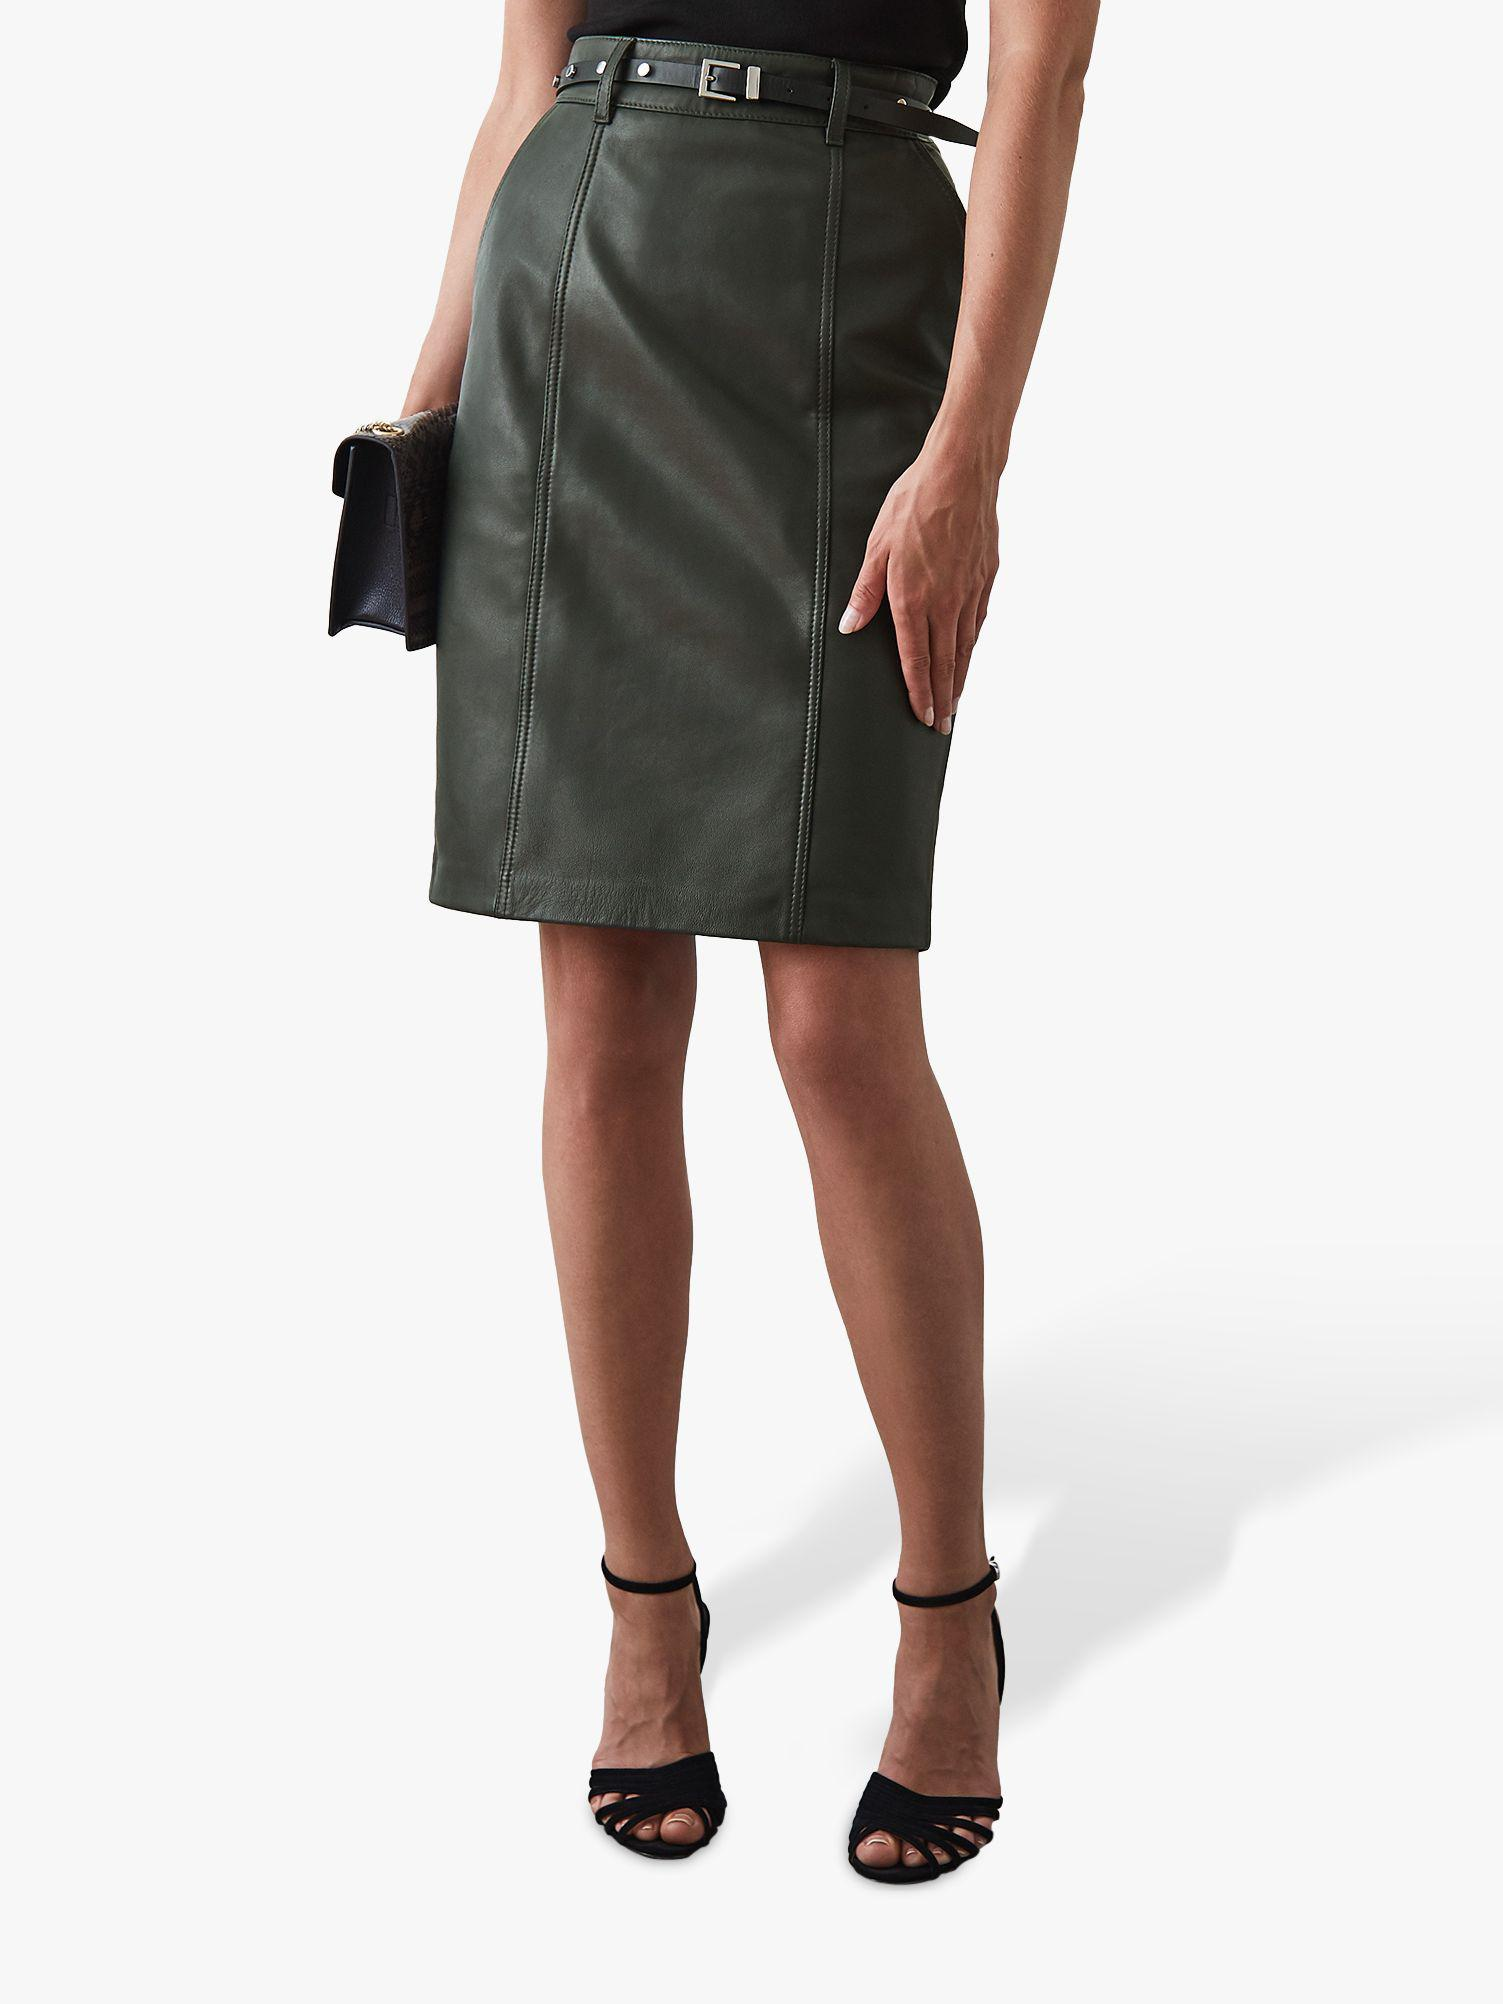 6b82cf8bfb Reiss. Women's Kara Leather Pencil Skirt